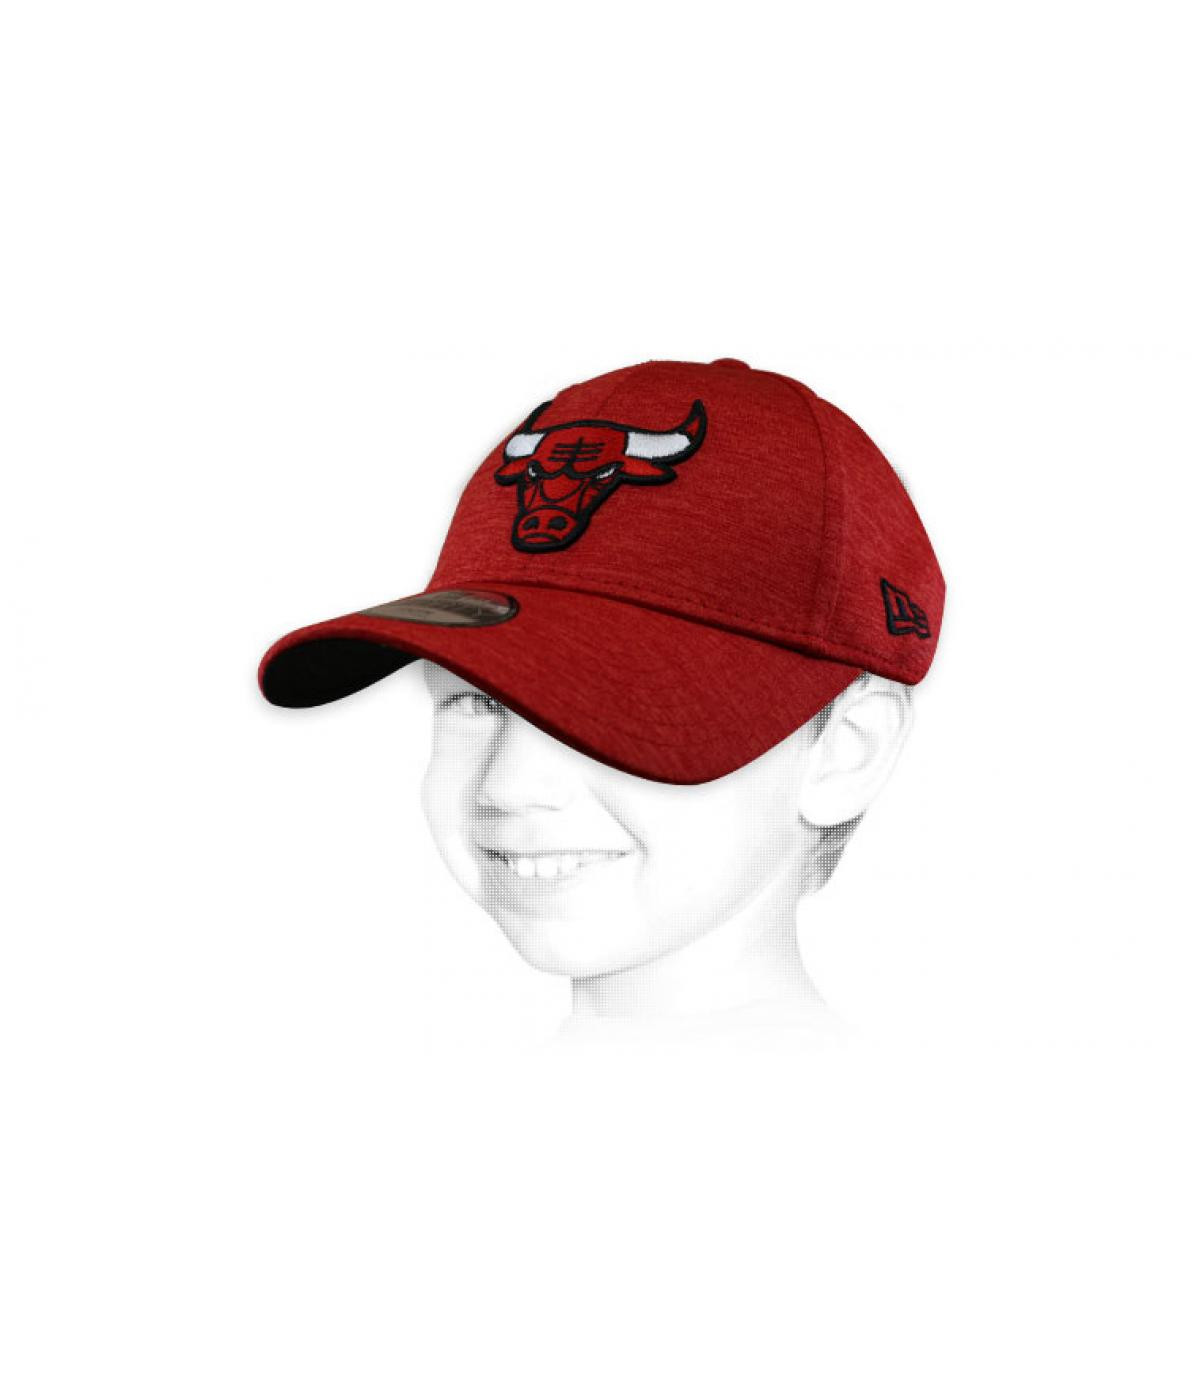 cappellino per bambini red bulls